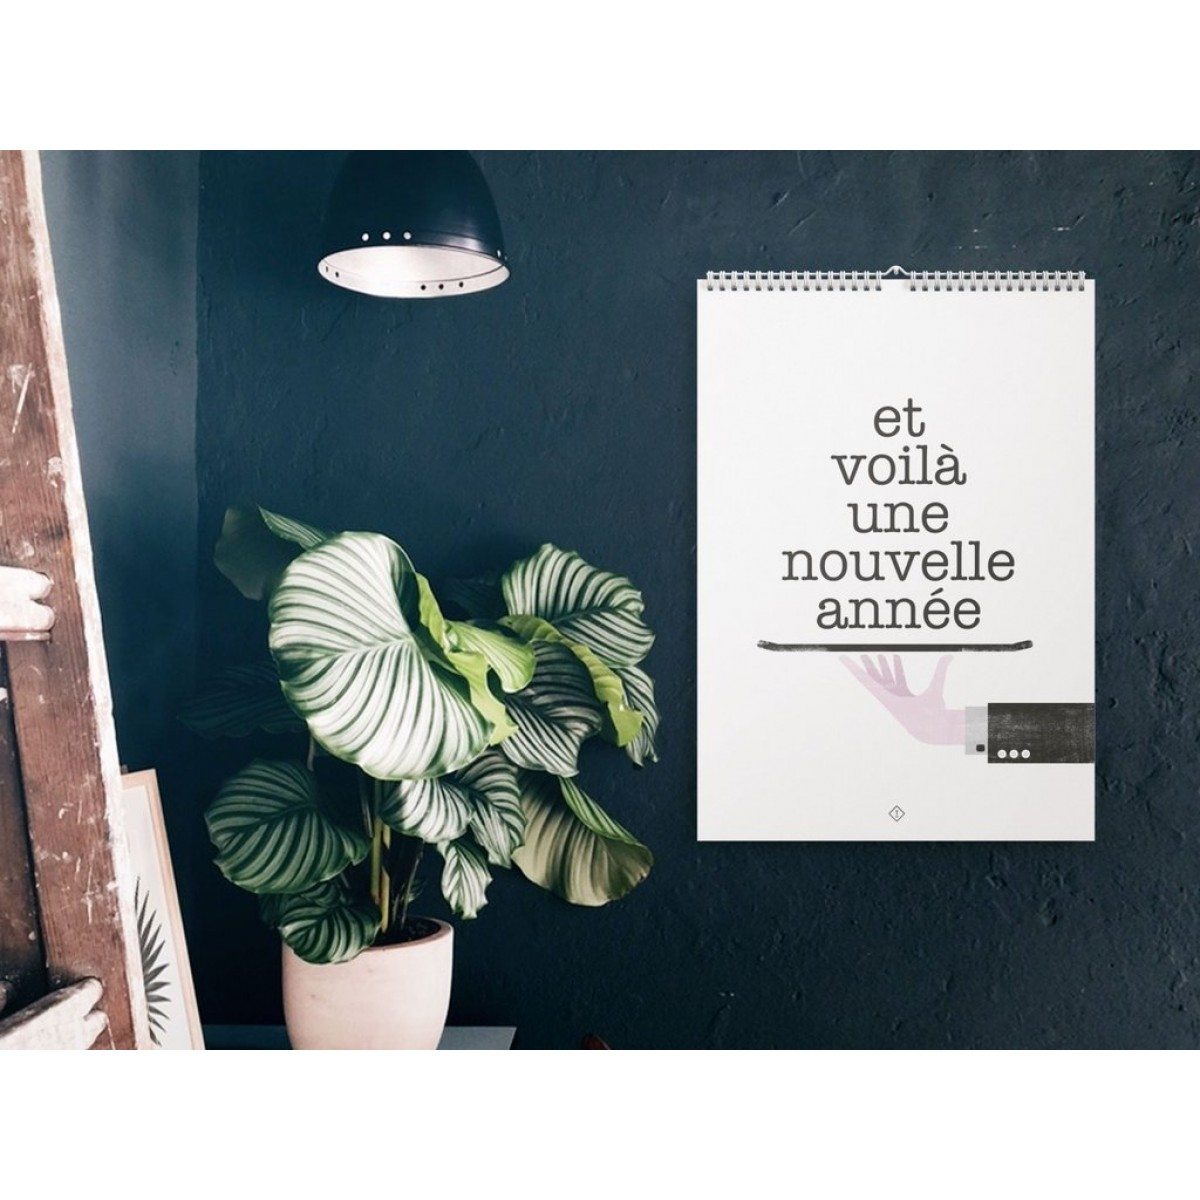 typealive / Wandkalender / Prints 2020